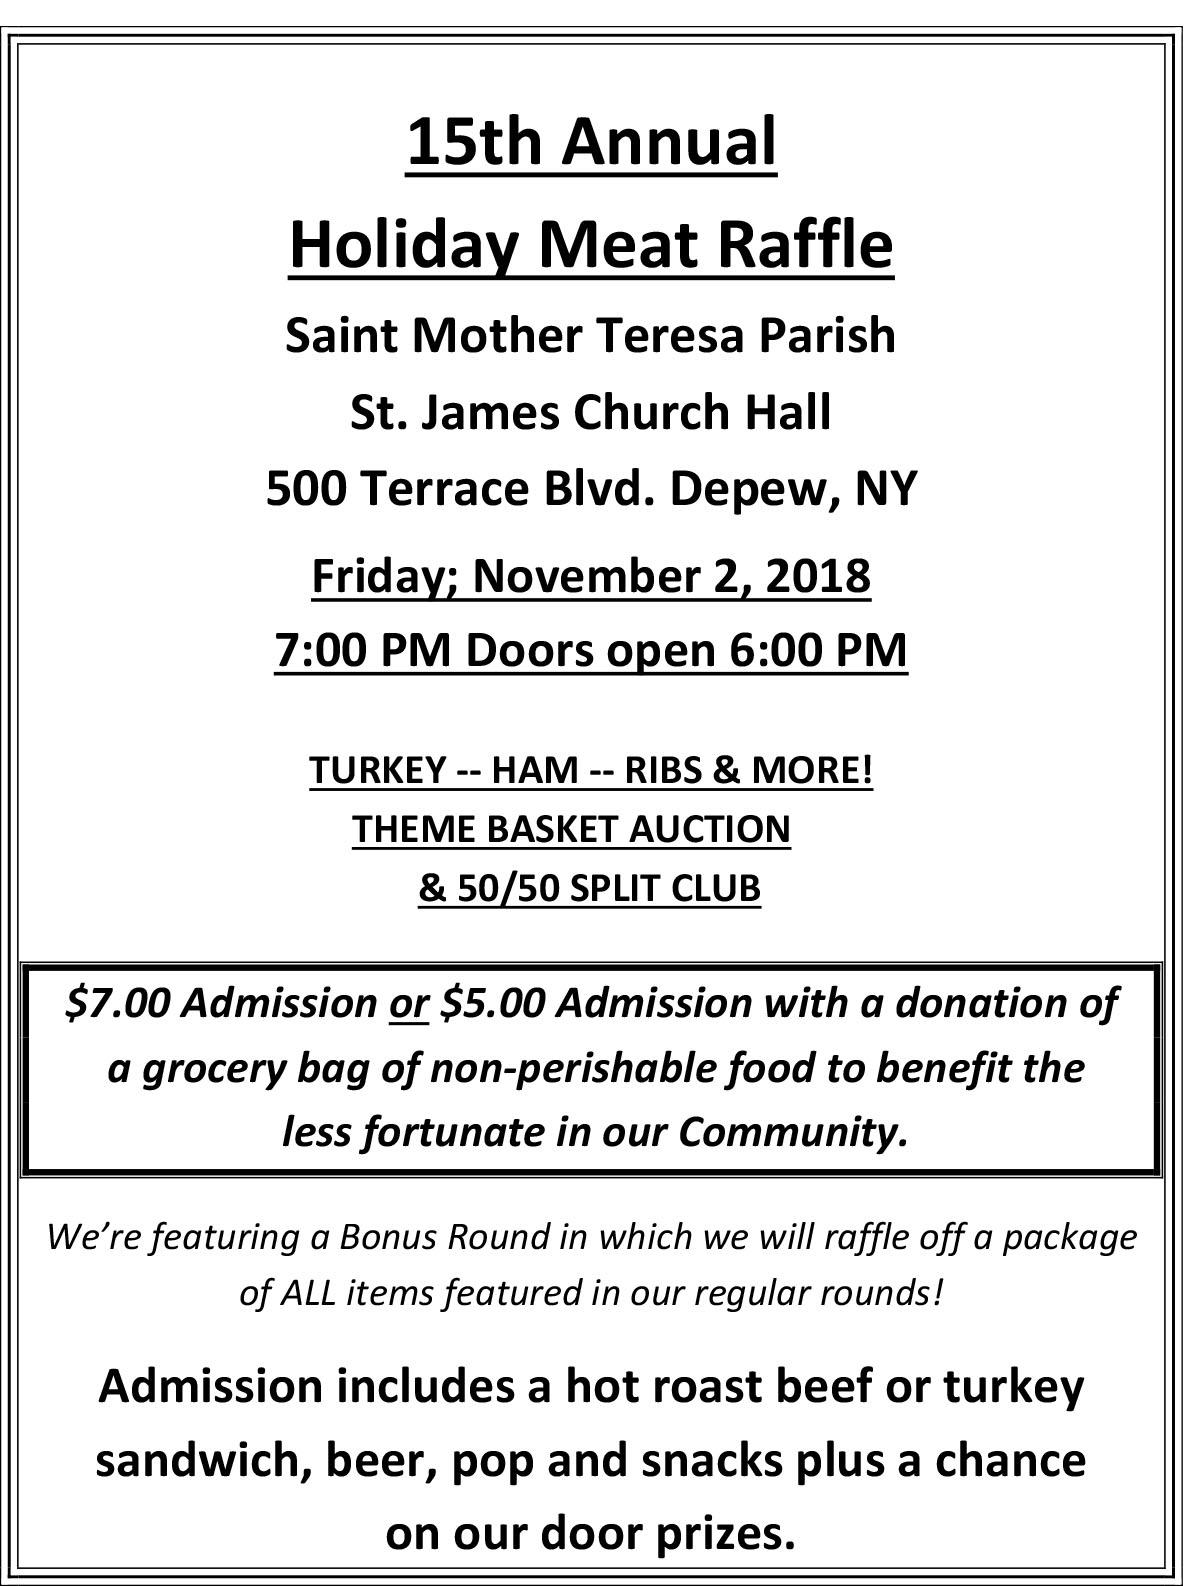 15th Annual Holiday Meat Raffle 110218.jpg